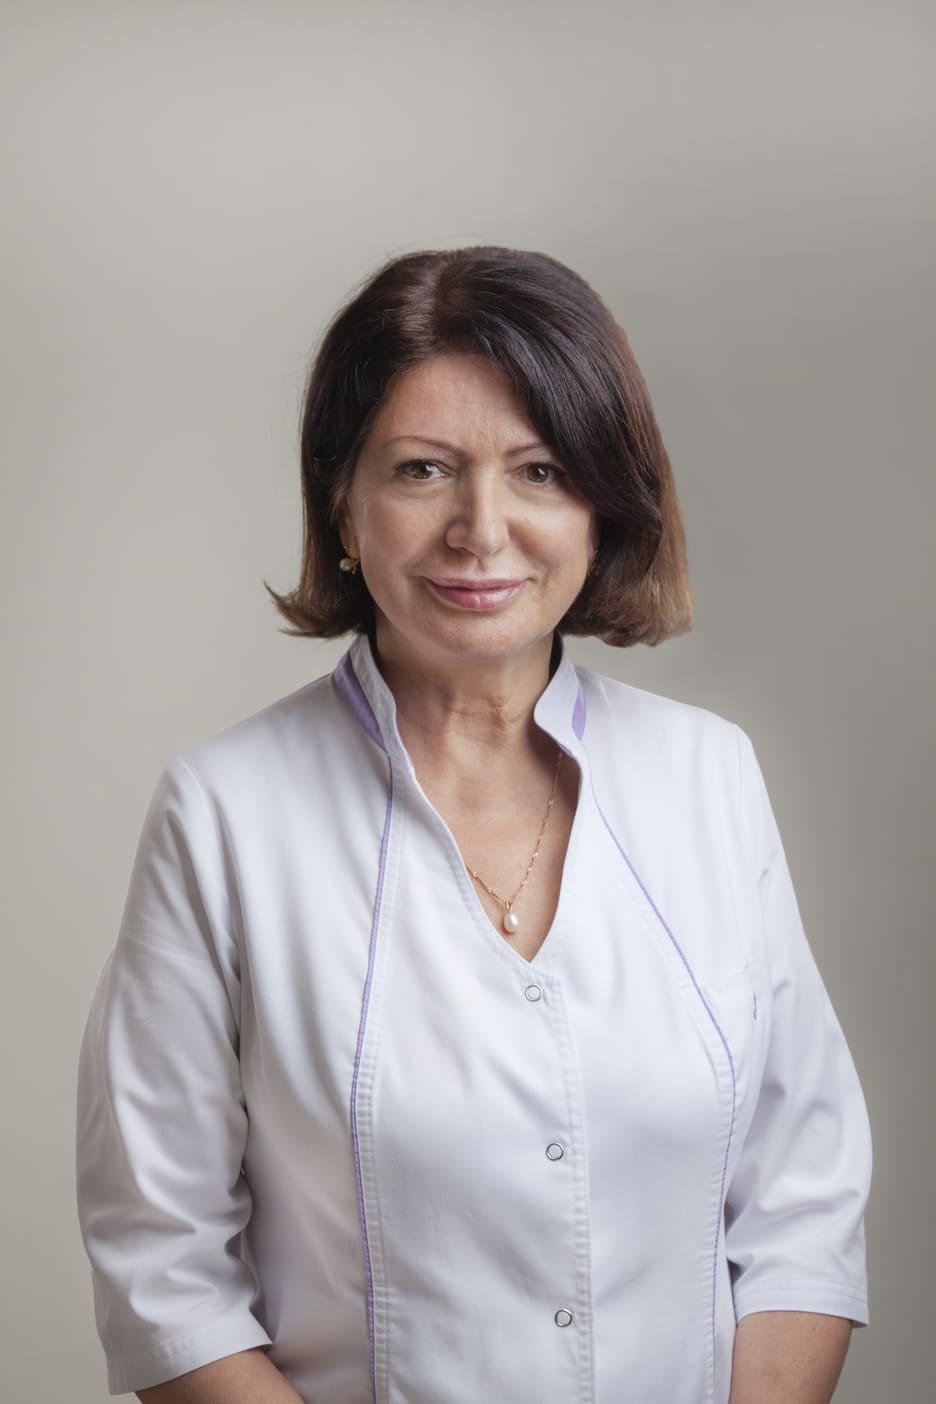 Кузьмичева Инеса Александровна